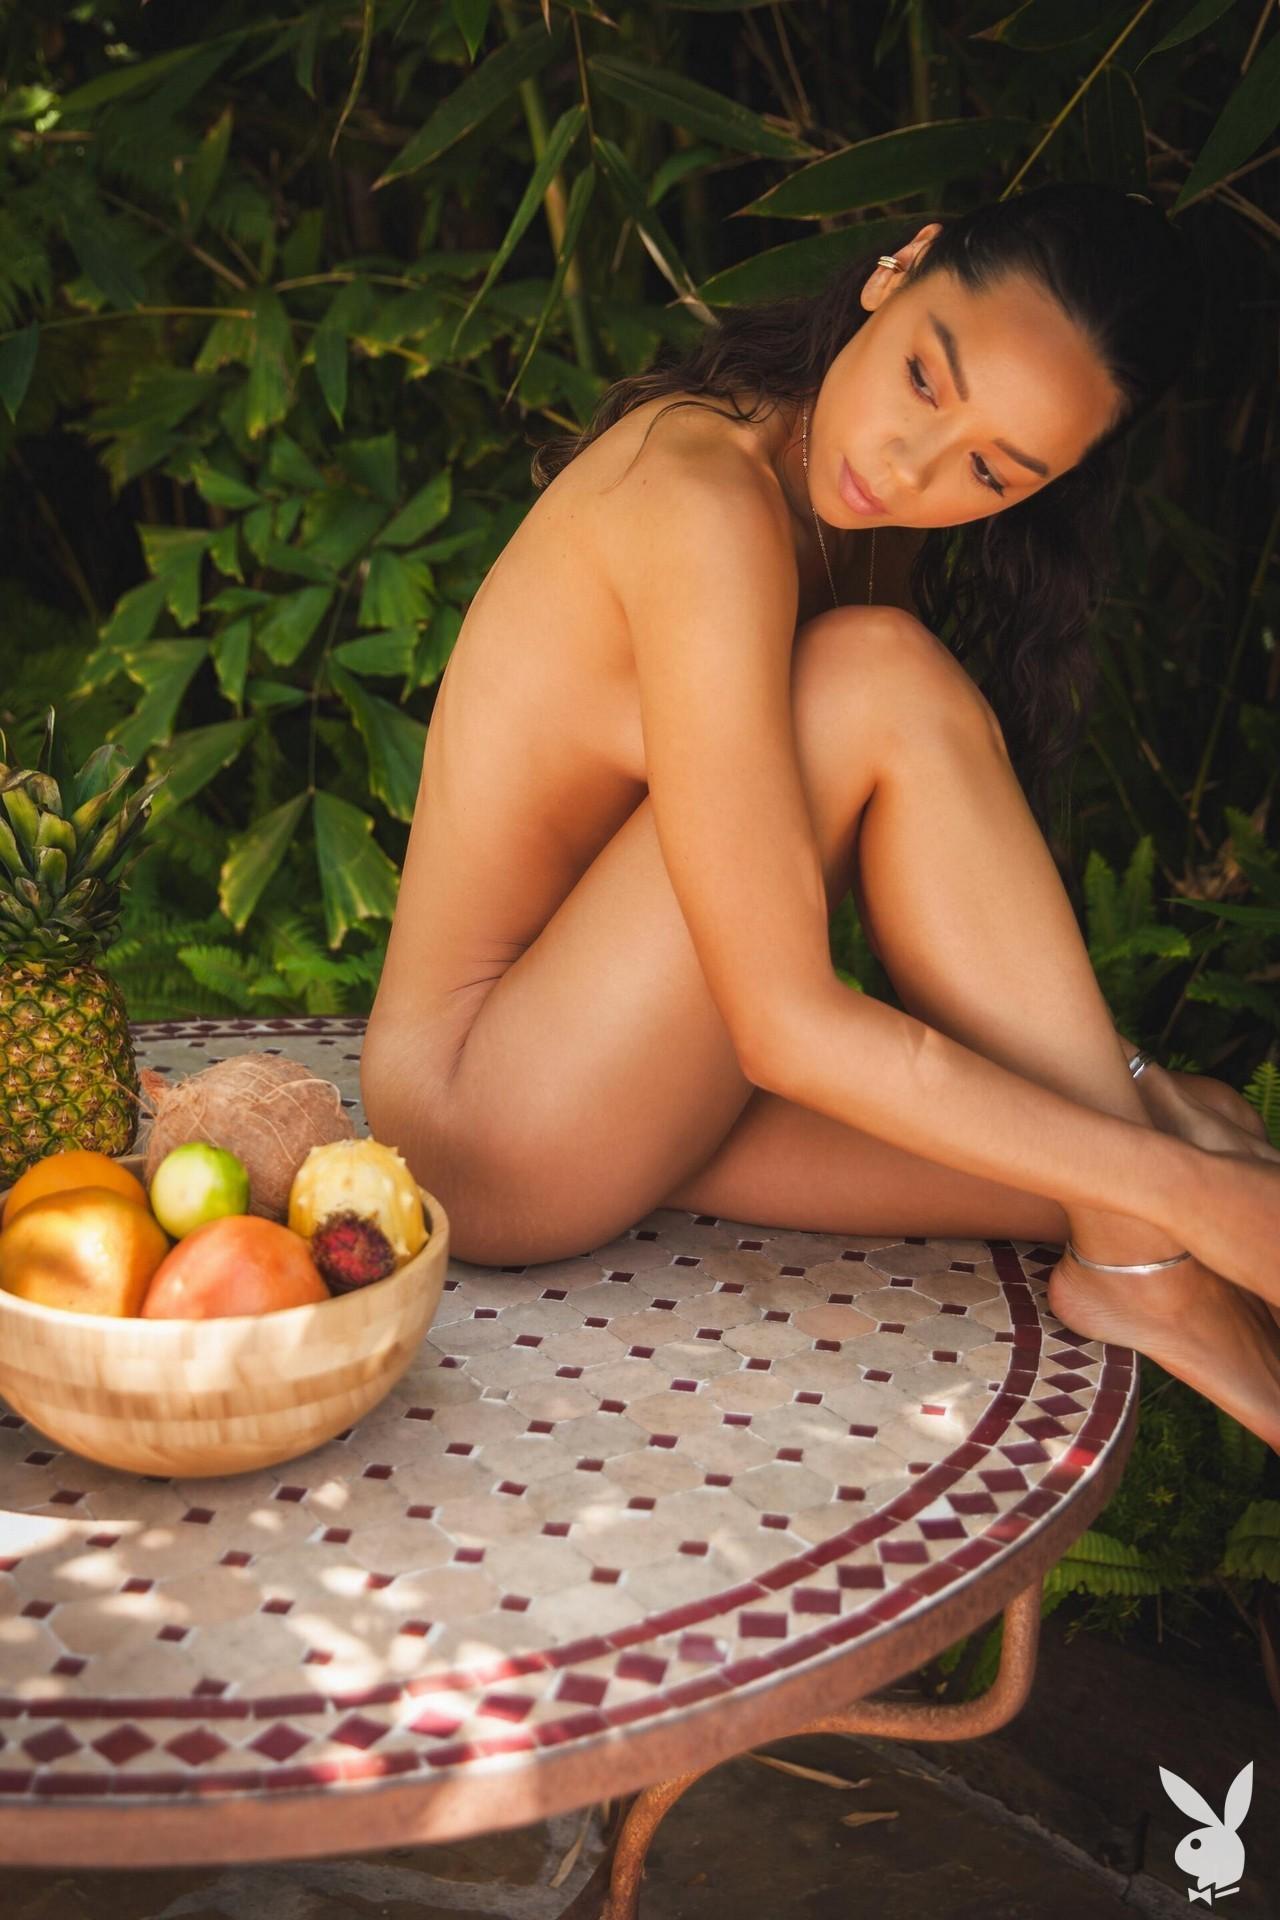 Playmate September 2020 Danielle Alcaraz Playboy Plus (27)